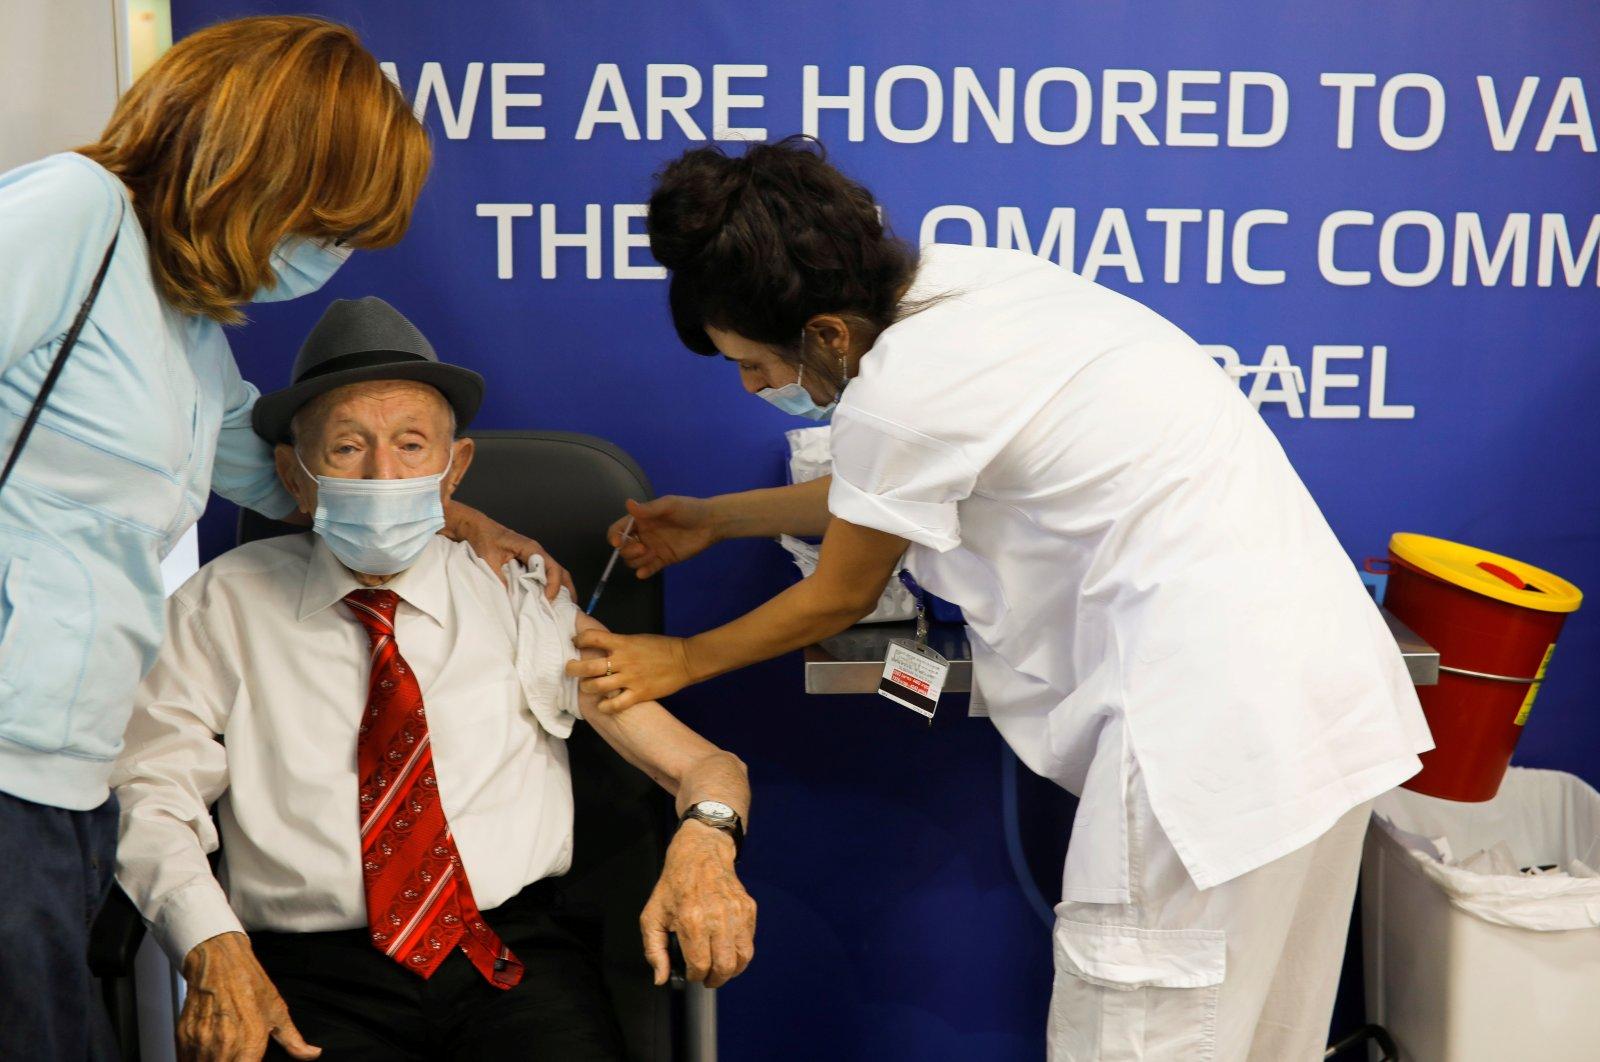 Holocaust survivor Yehuda Widawski, 102, receives his third dose of a COVID-19 vaccine at Sourasky Medical Center (Ichilov Hospital) in Tel Aviv, Israel, Aug. 1, 2021. (Reuters Photo)